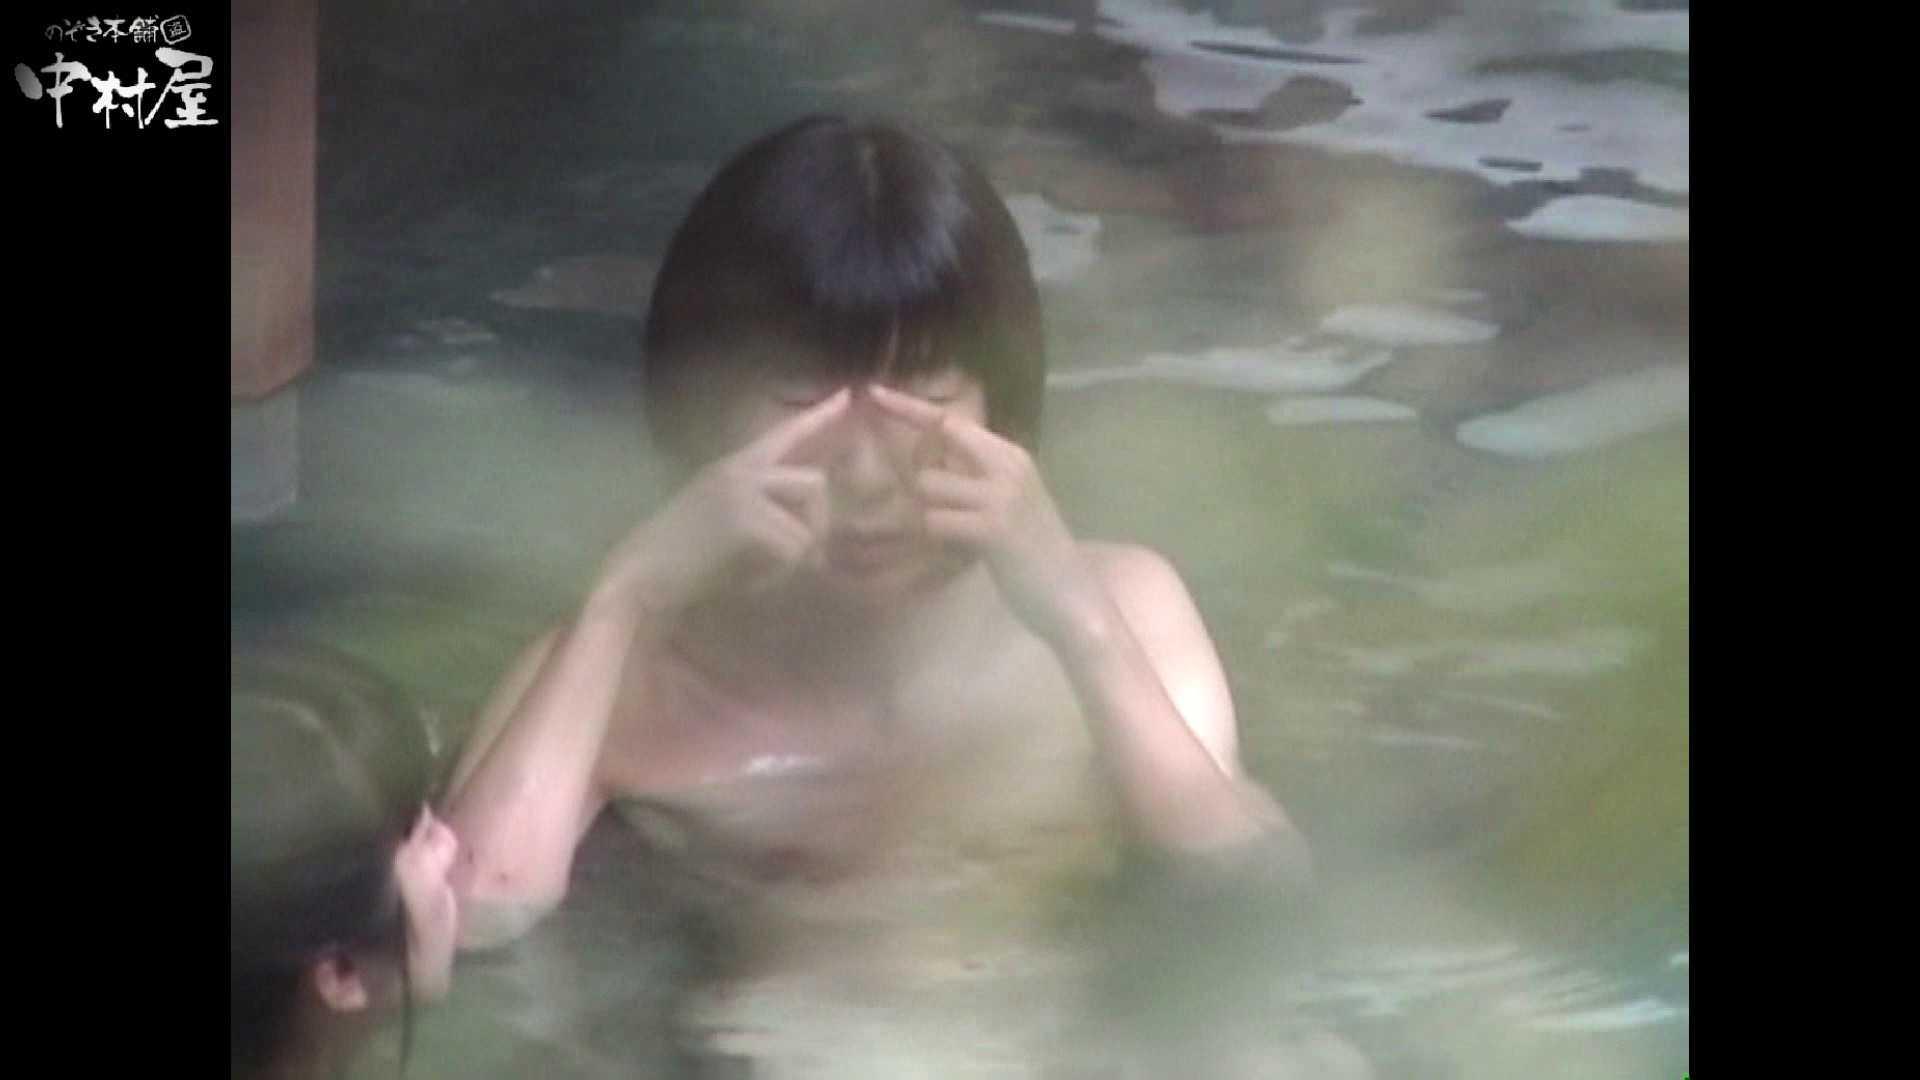 Aquaな露天風呂Vol.953 OLのエロ生活   露天風呂  107連発 70